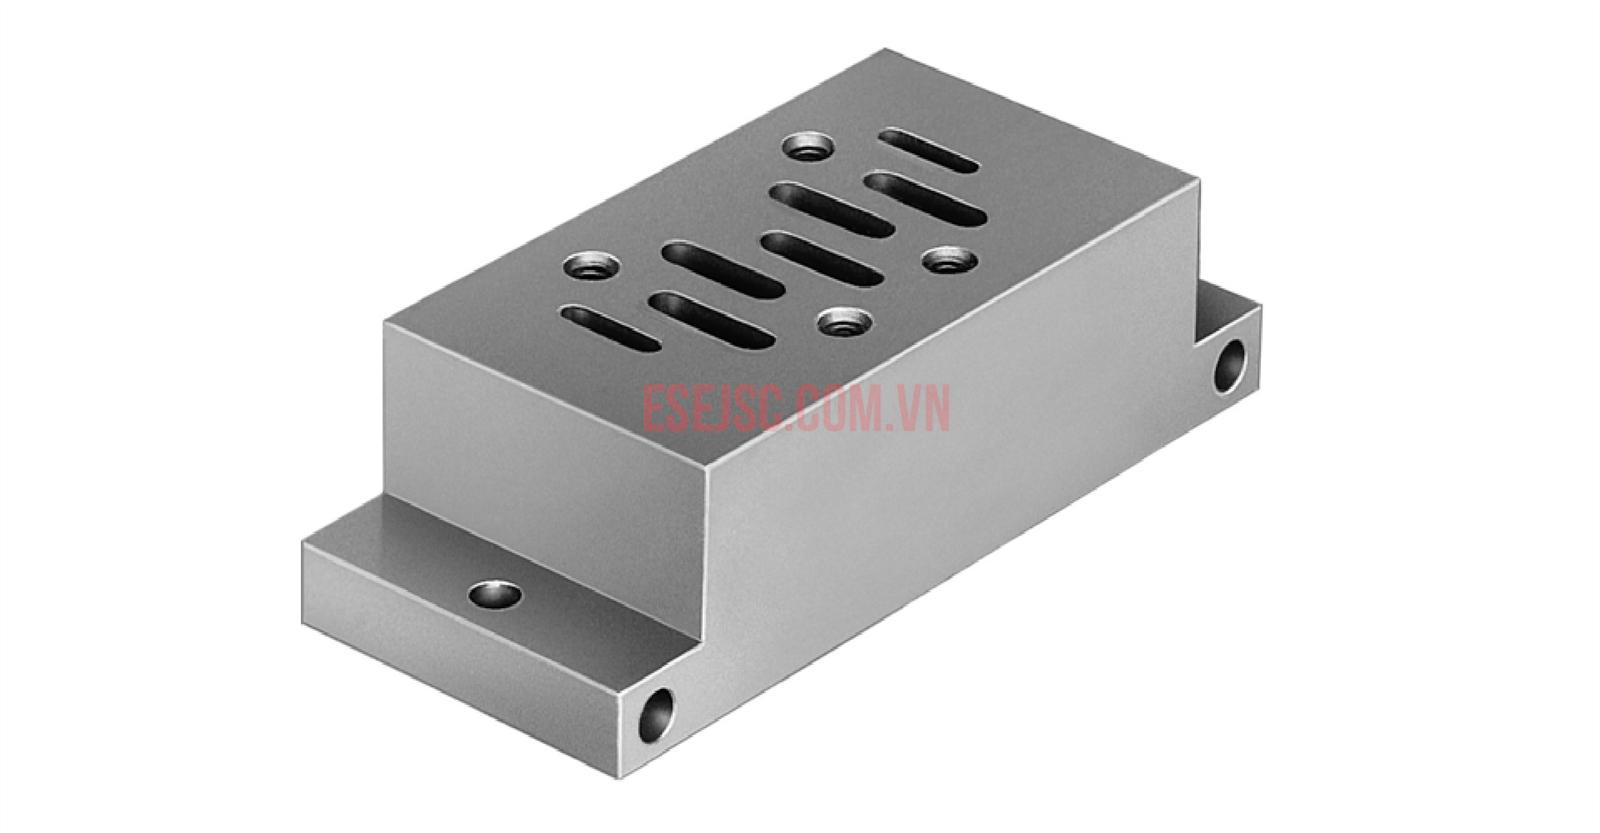 Van điện từ khí nén  Parker ISO 5599 - 1 VDMA 24345 Subbase